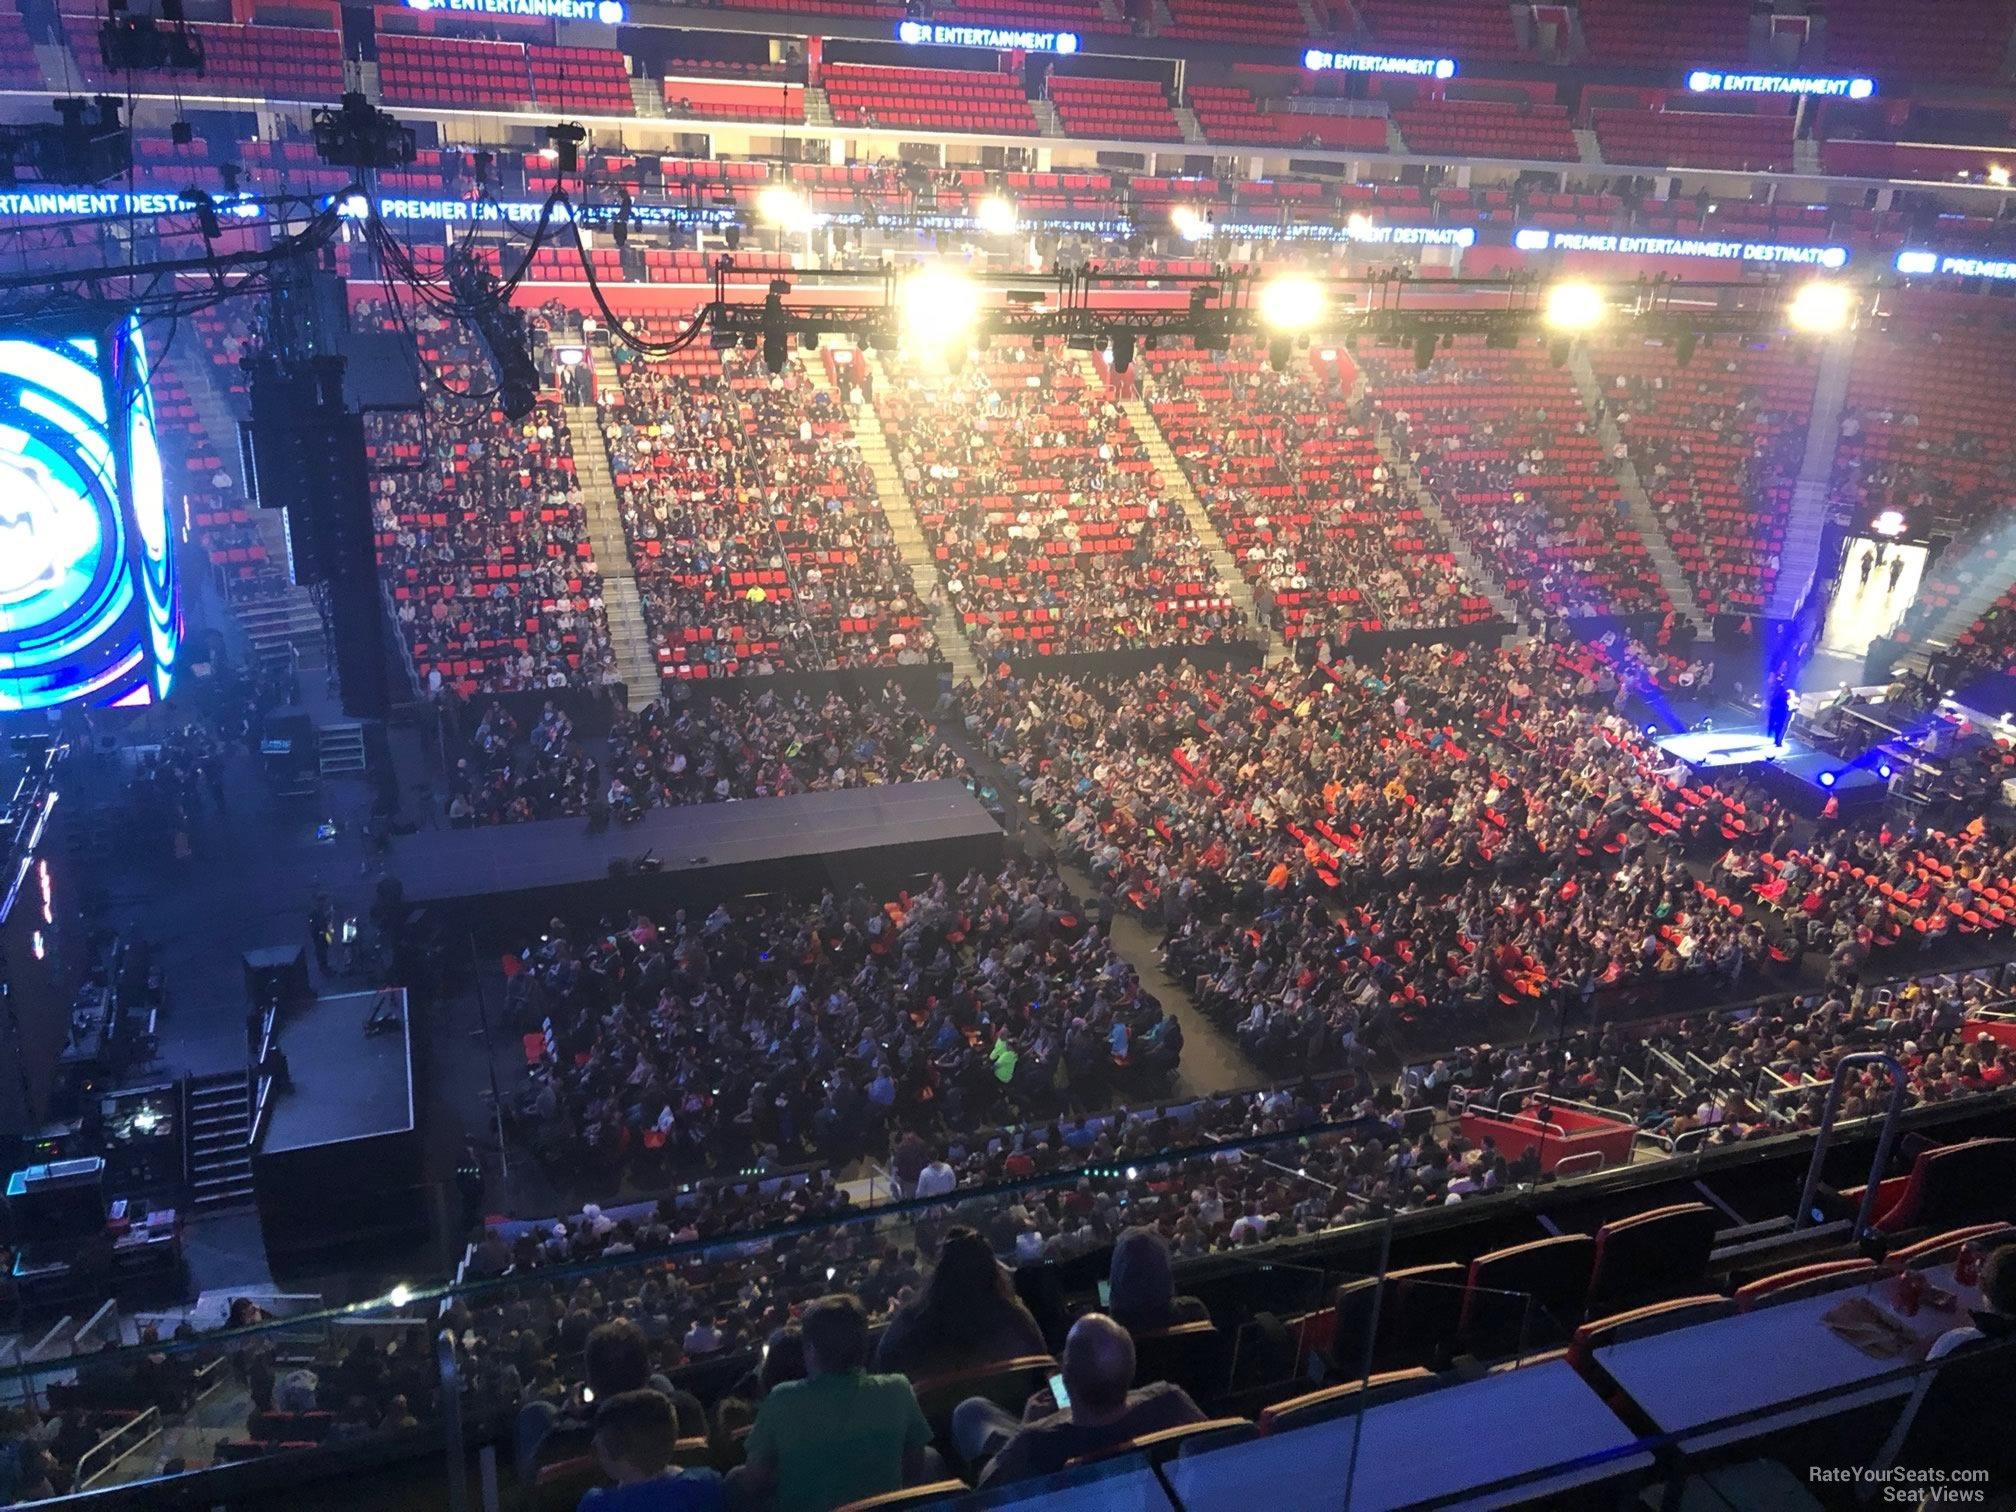 Mezzanine 31 seat view